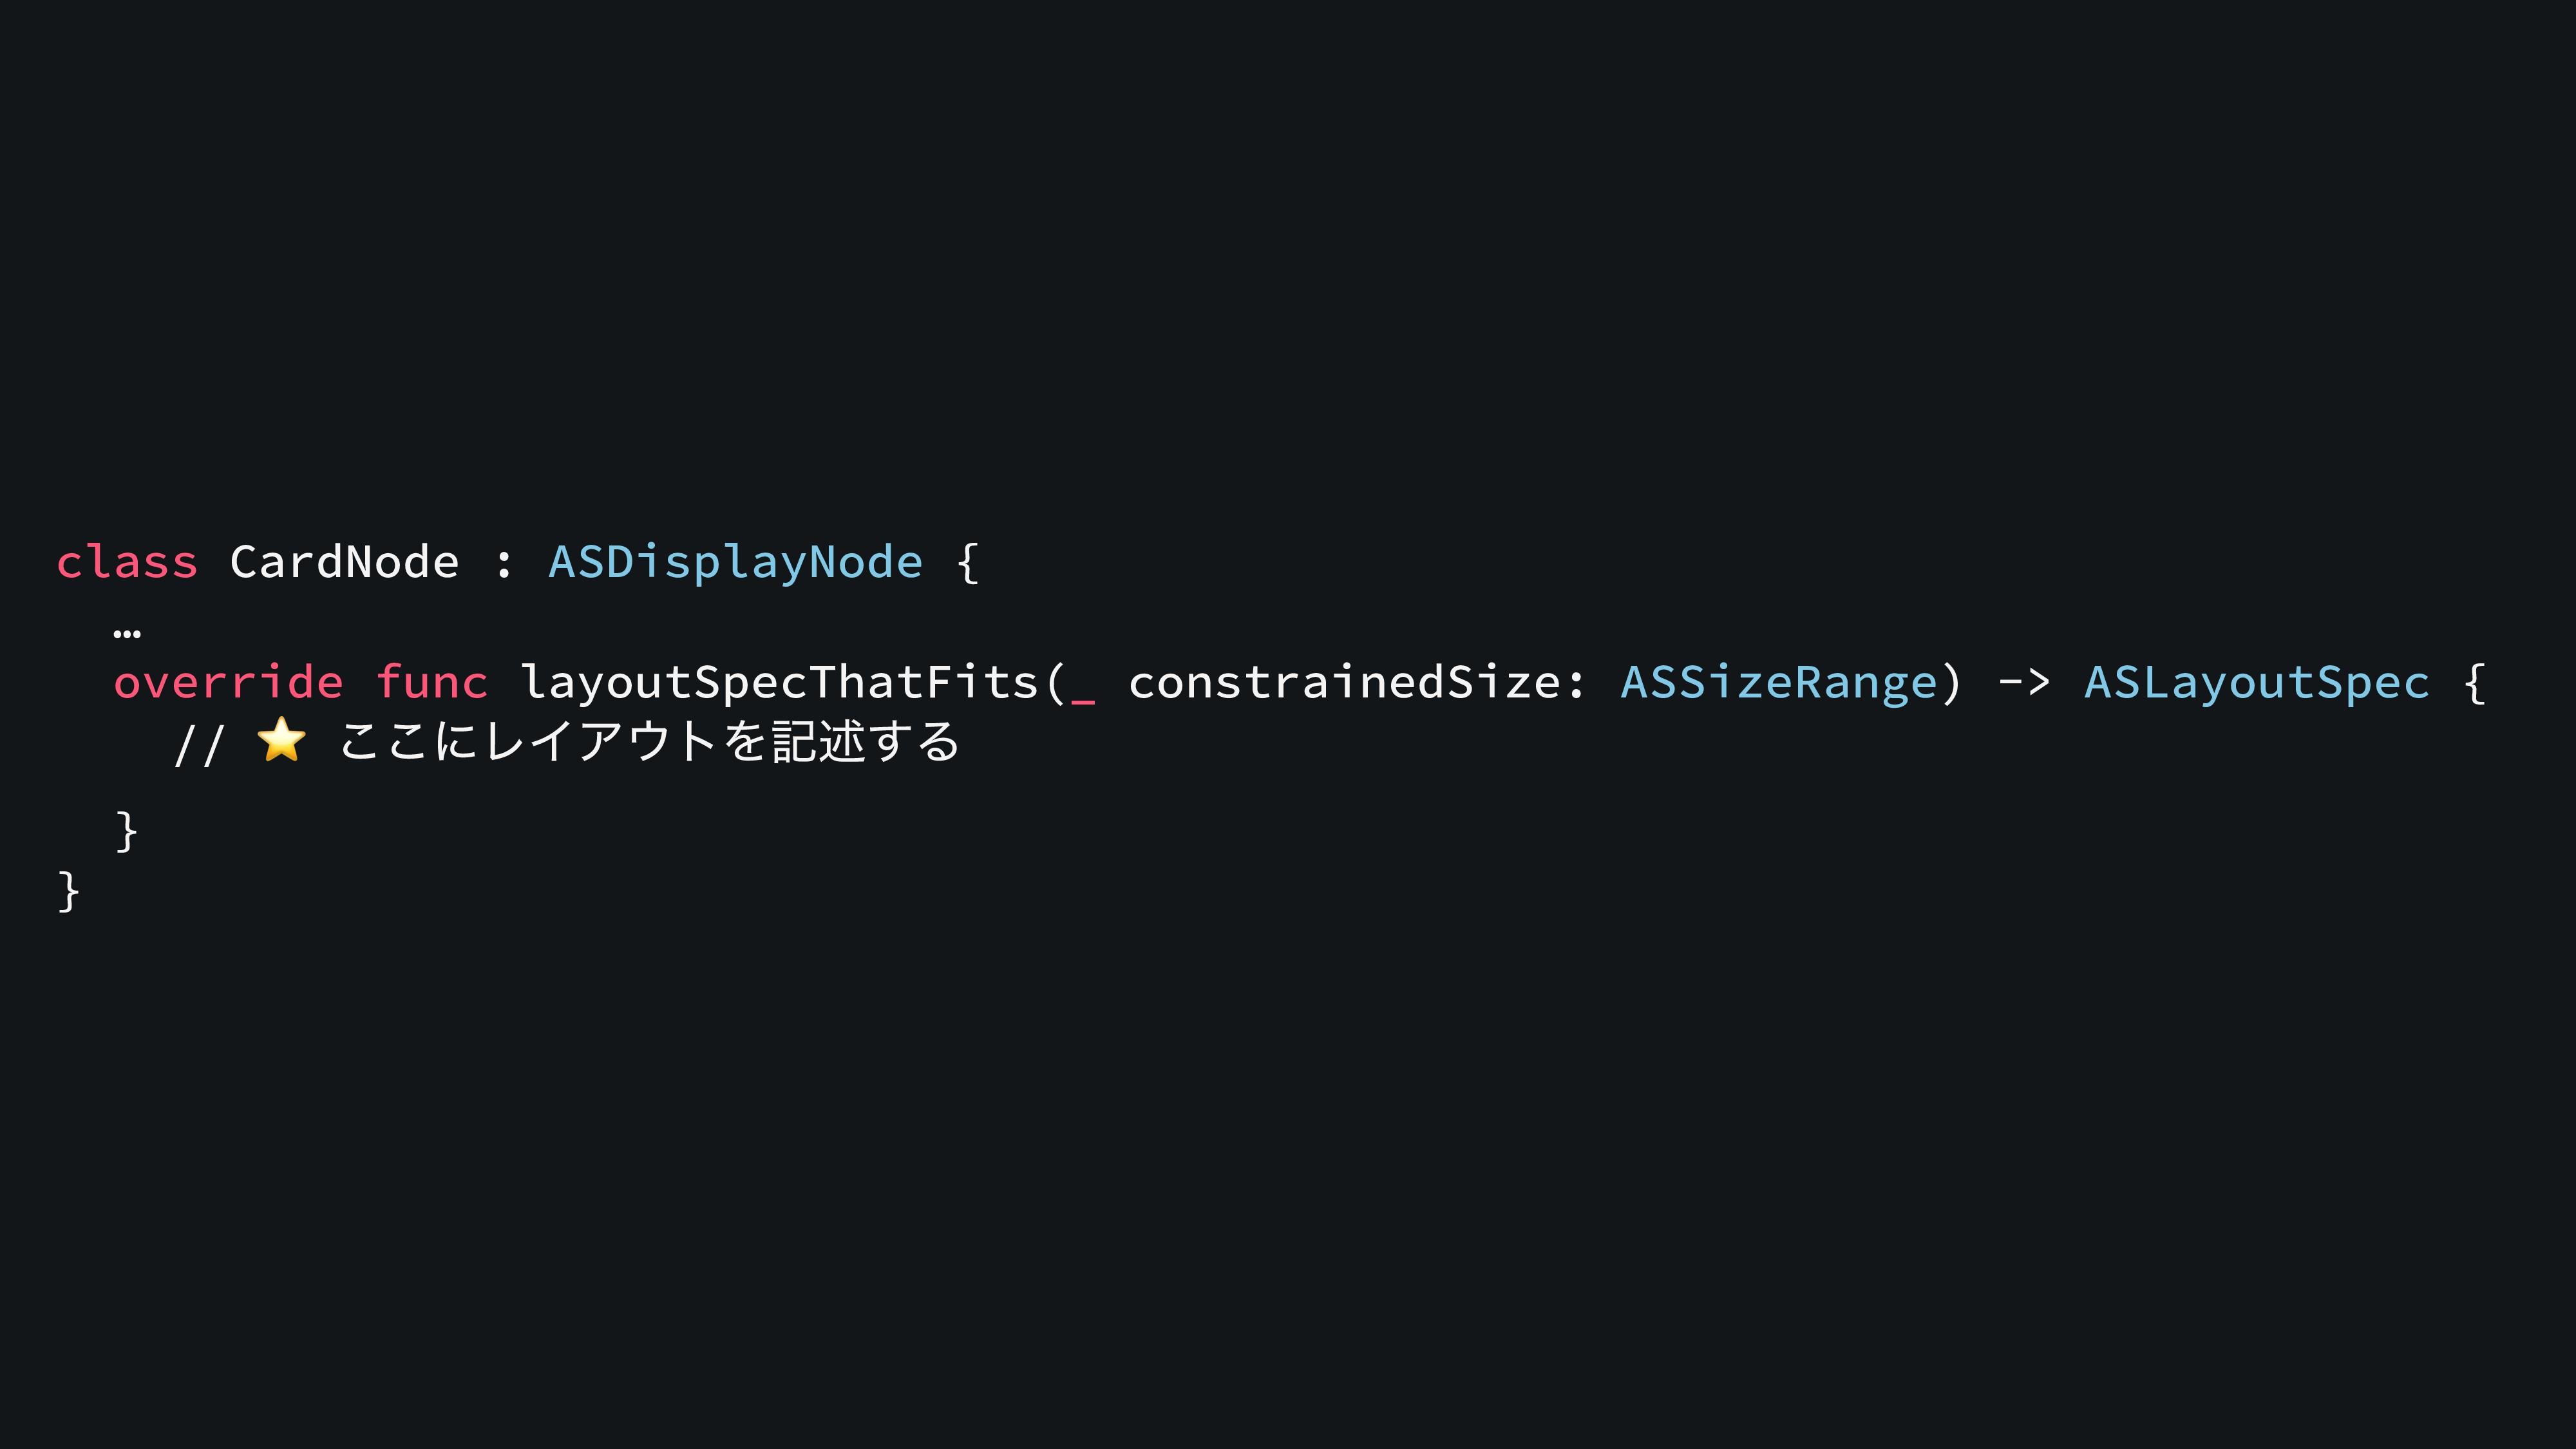 class CardNode : ASDisplayNode { … override fun...